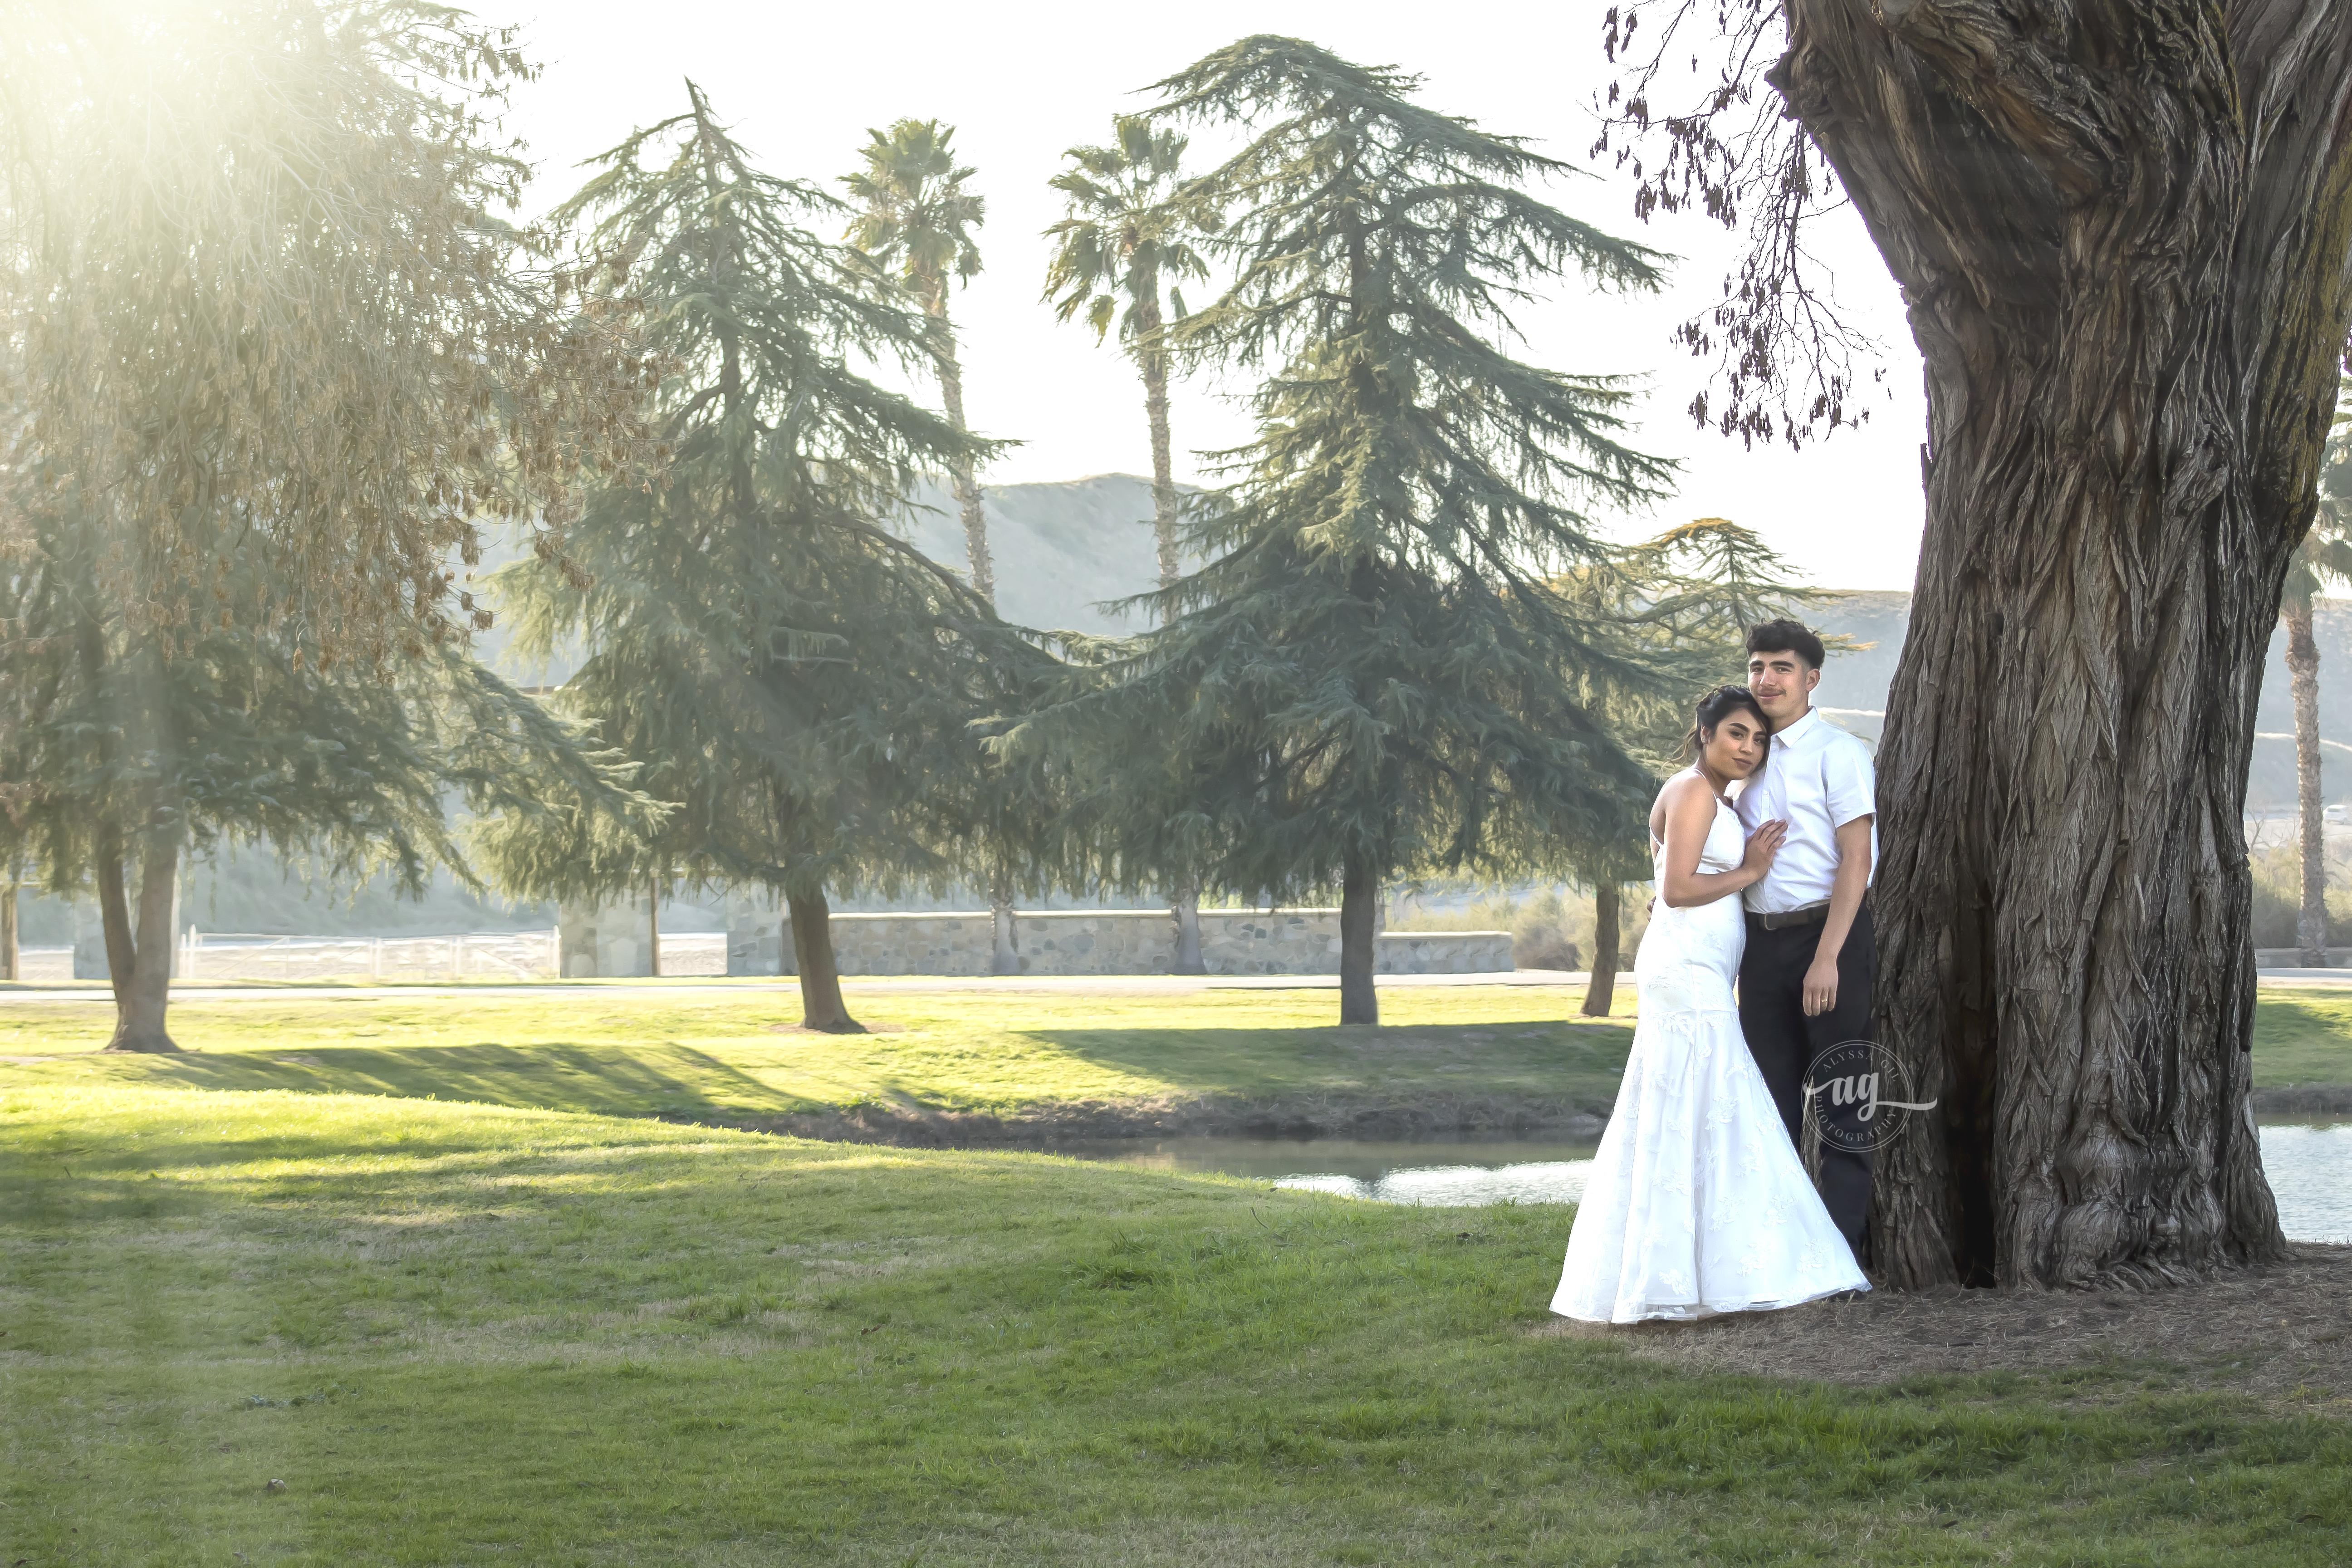 Bakersfield Wedding Portrait - Alyssa Gi